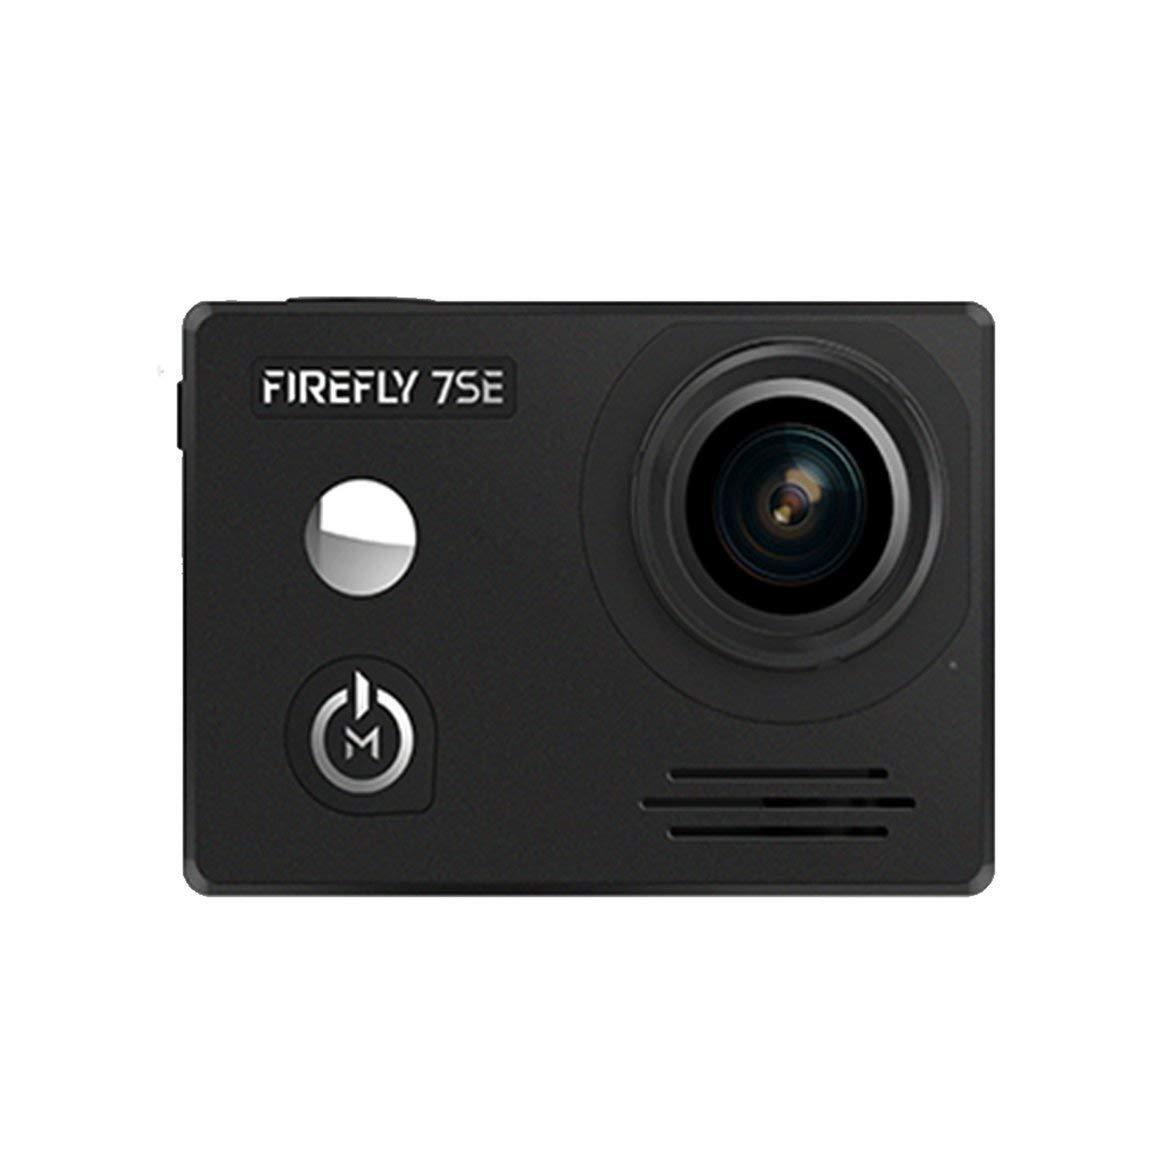 Kongqiabona Firefly 7SE Cam Sport Kamera Firefly Kamera WiFi Sport Kamera Wasserdichte Sport Kamera 170 ° FOV Sport Kamera Blautooth Sport Kamera